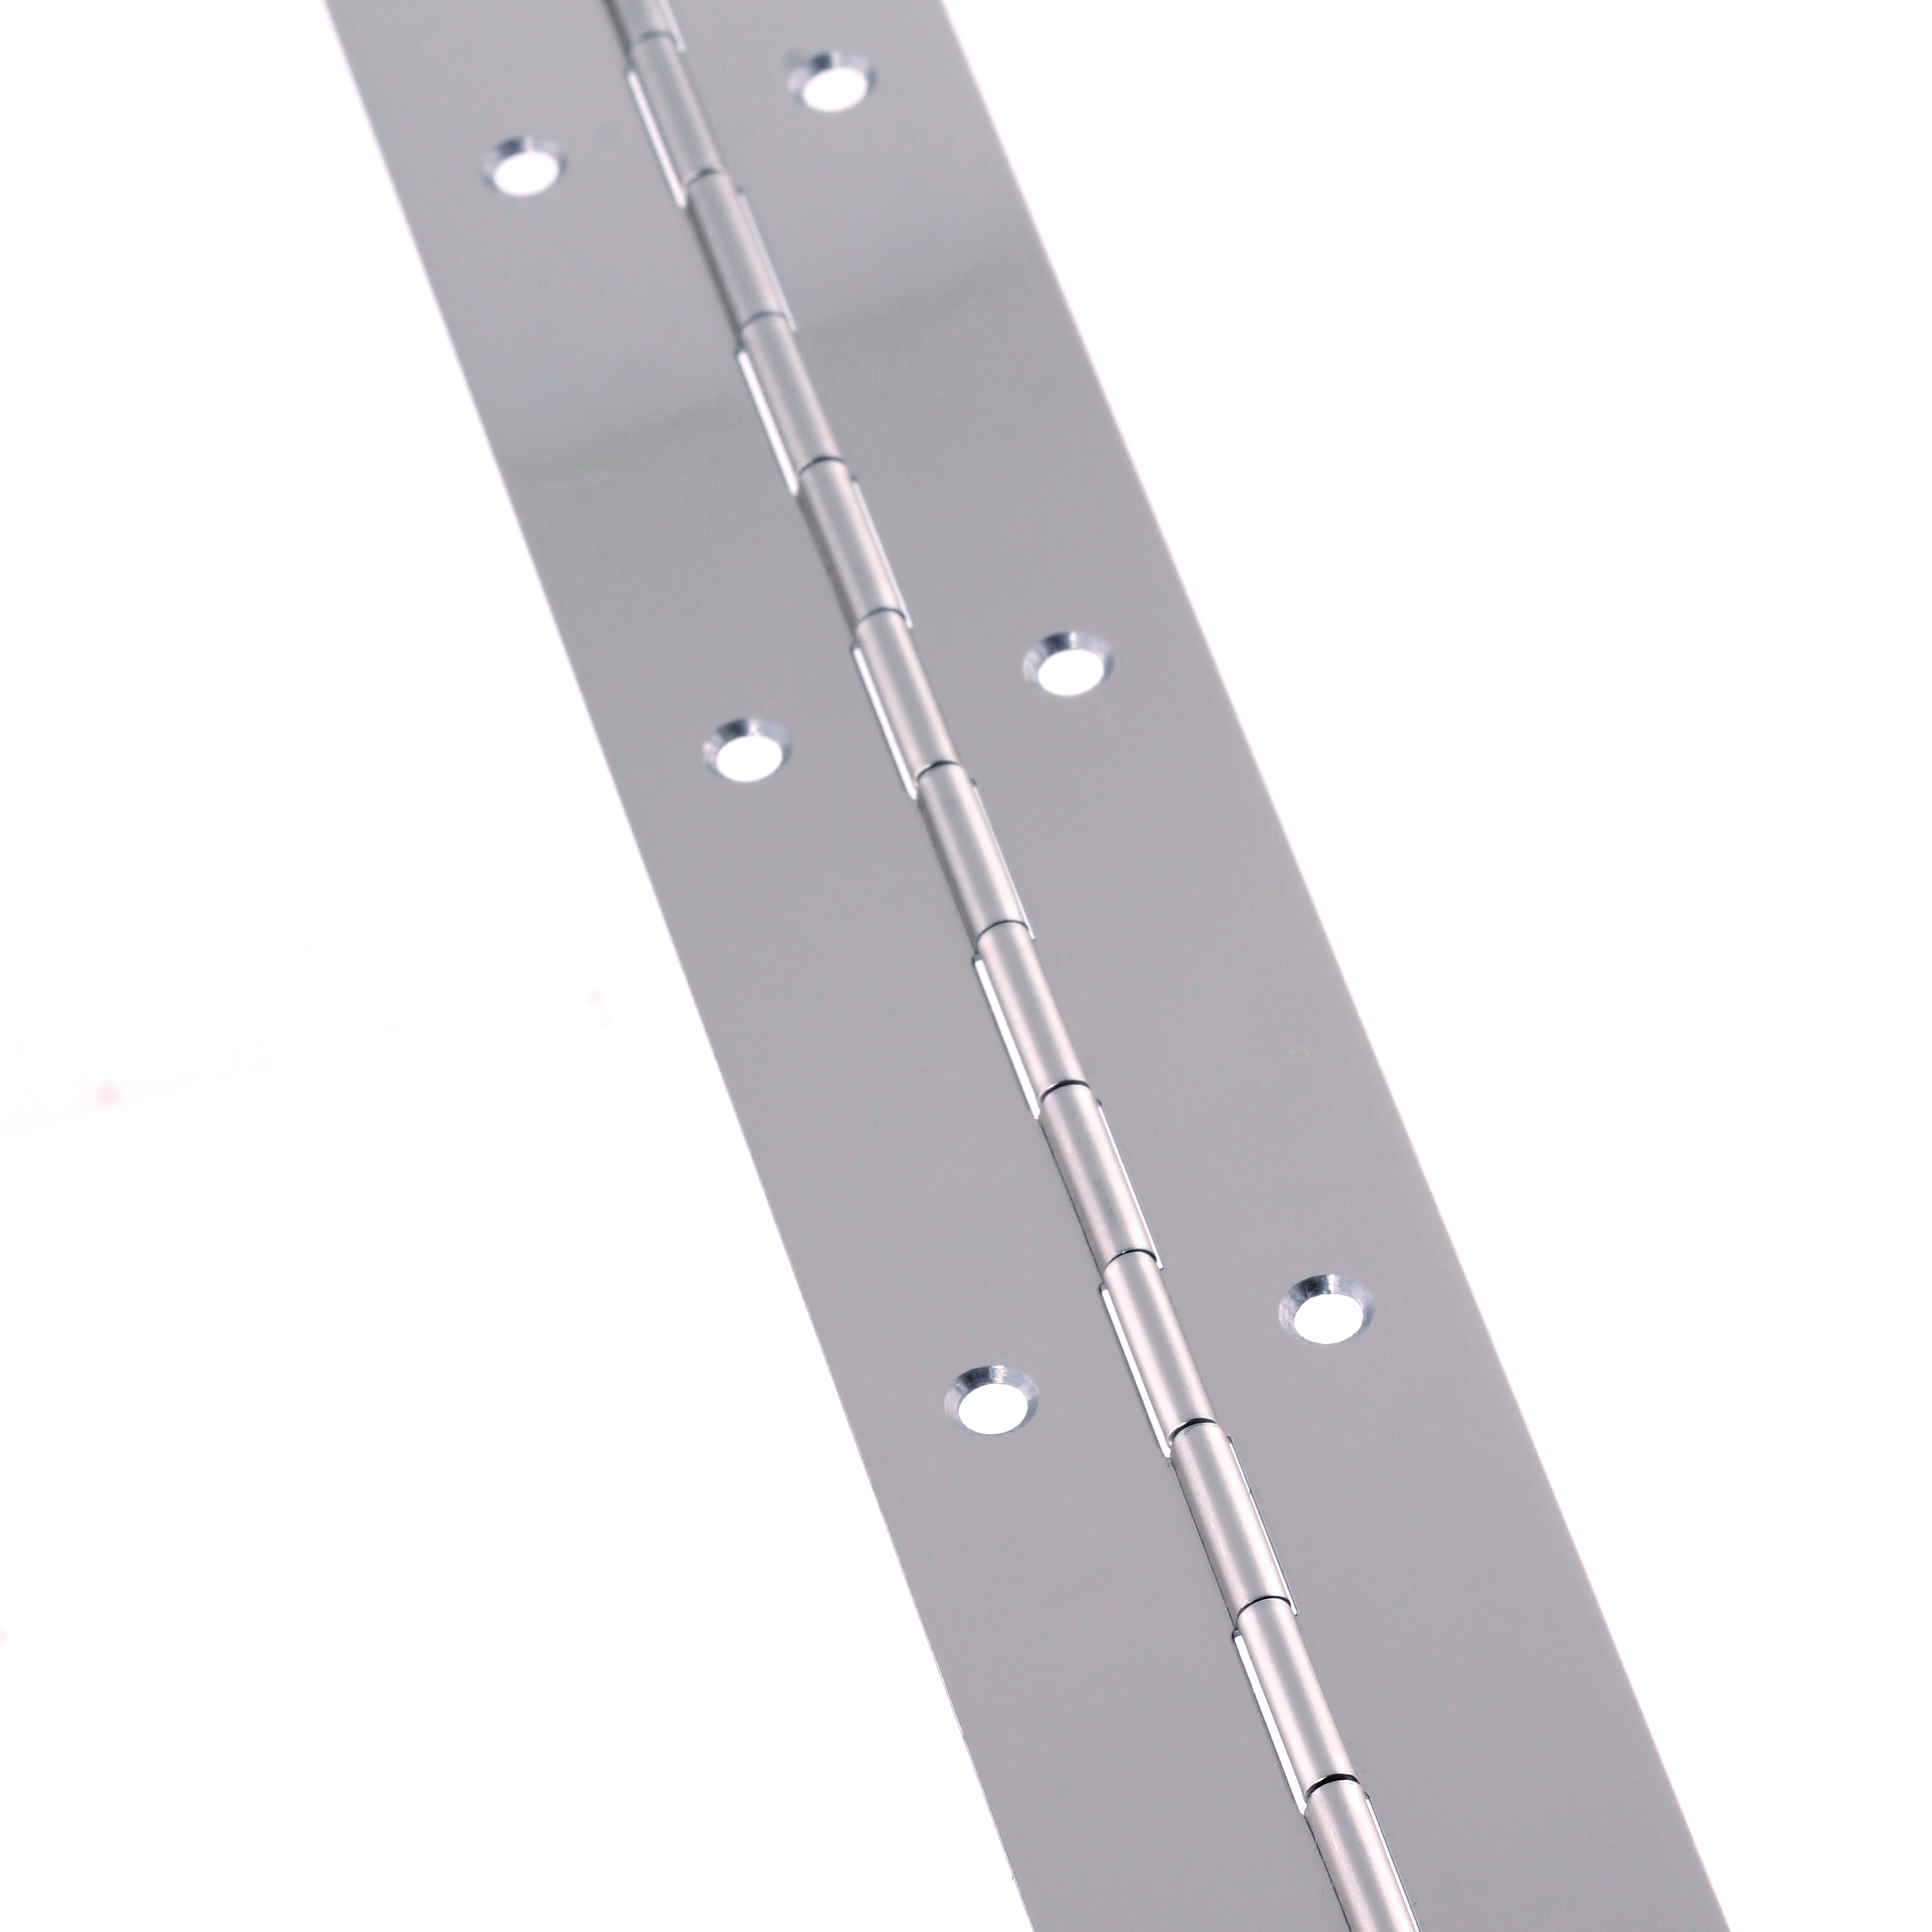 Steel Piano Hinge - 1800 x 38 x 0.7mm - Nickel Plated